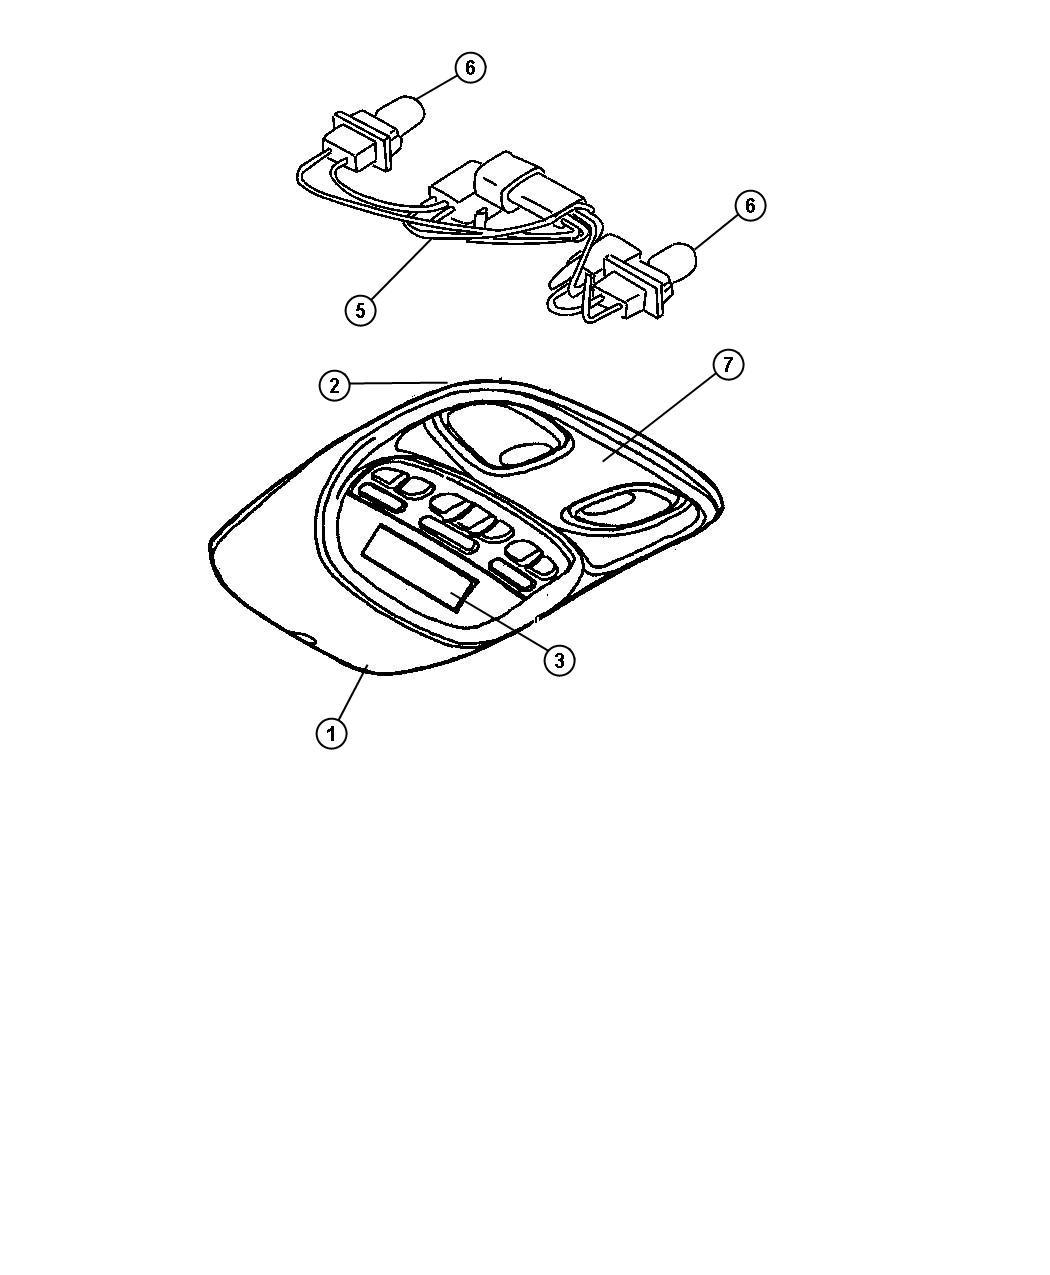 2006 jeep liberty switch  sunroof   mini overhead console   trim   all trim codes  color